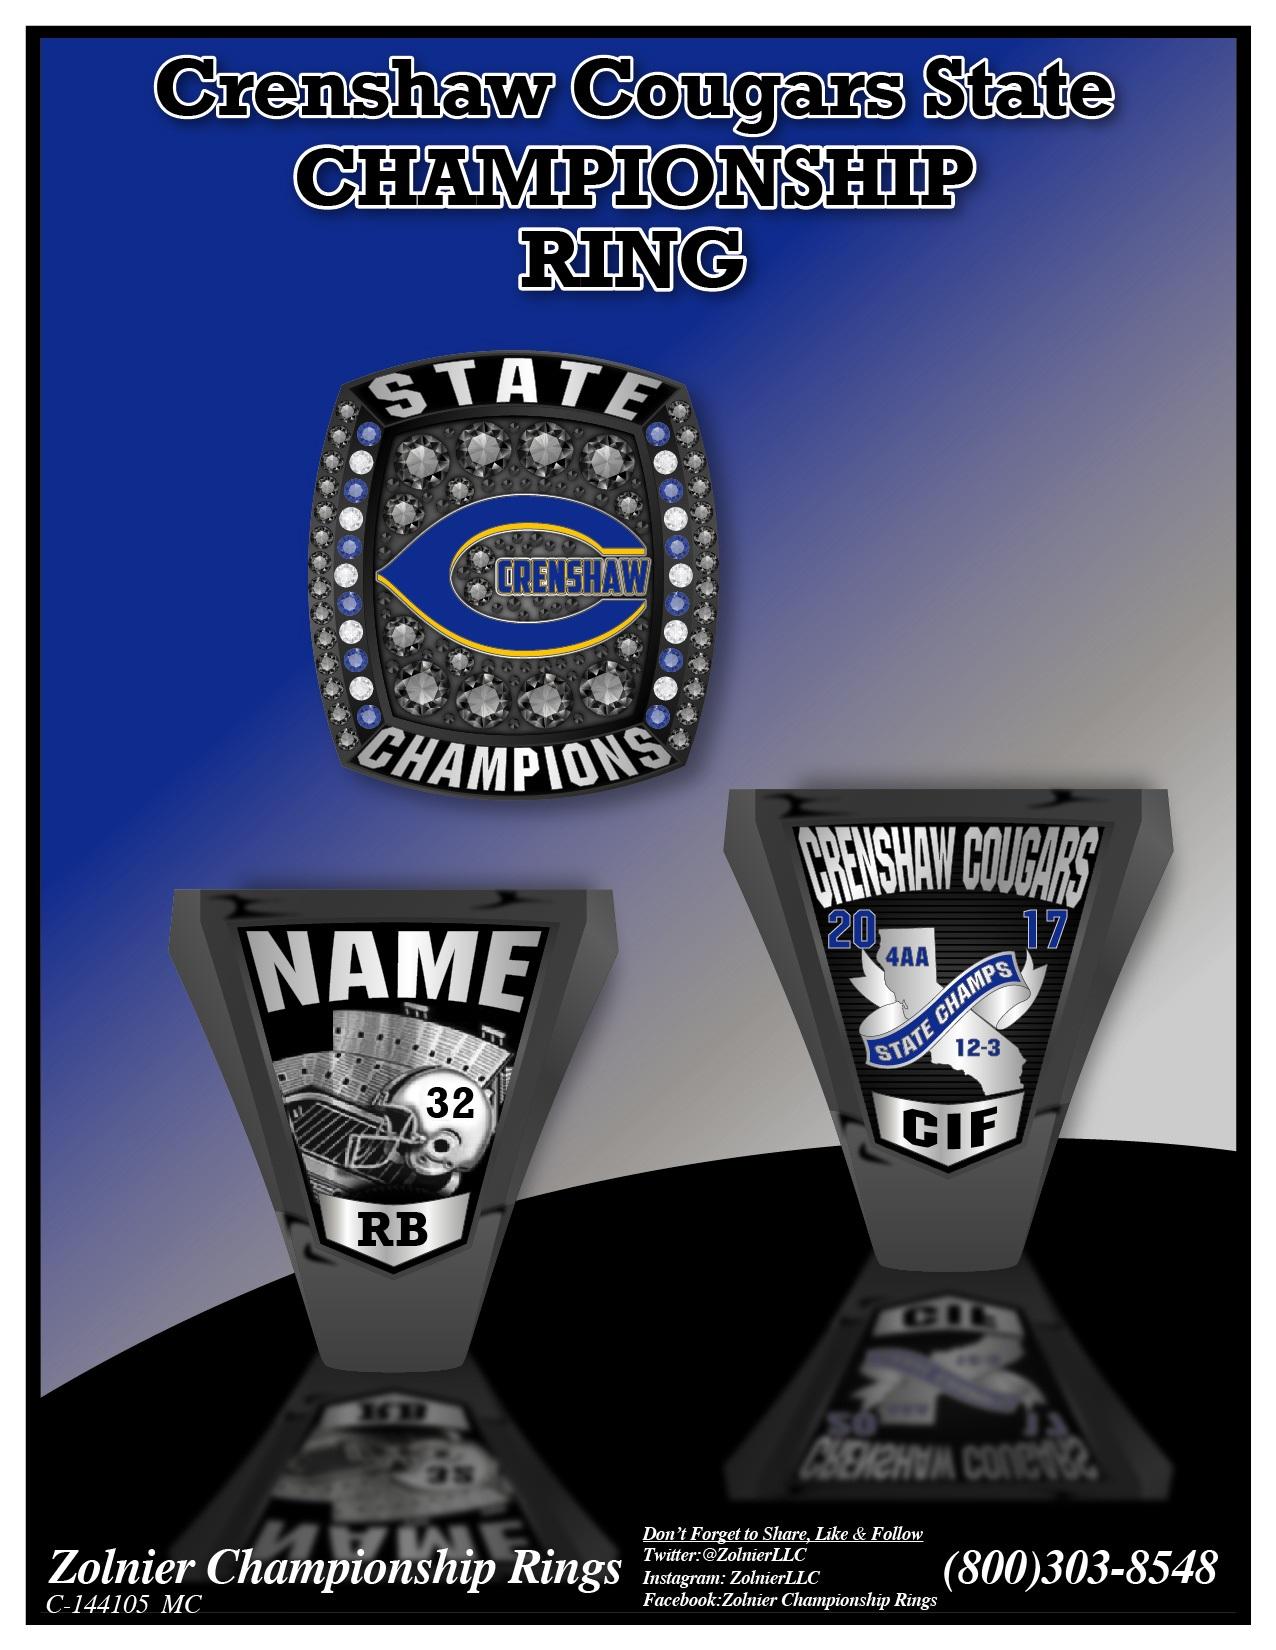 C-144105 ZOLNIER LLT Crenshaw Courgars Champ Ring MC-01 (1)